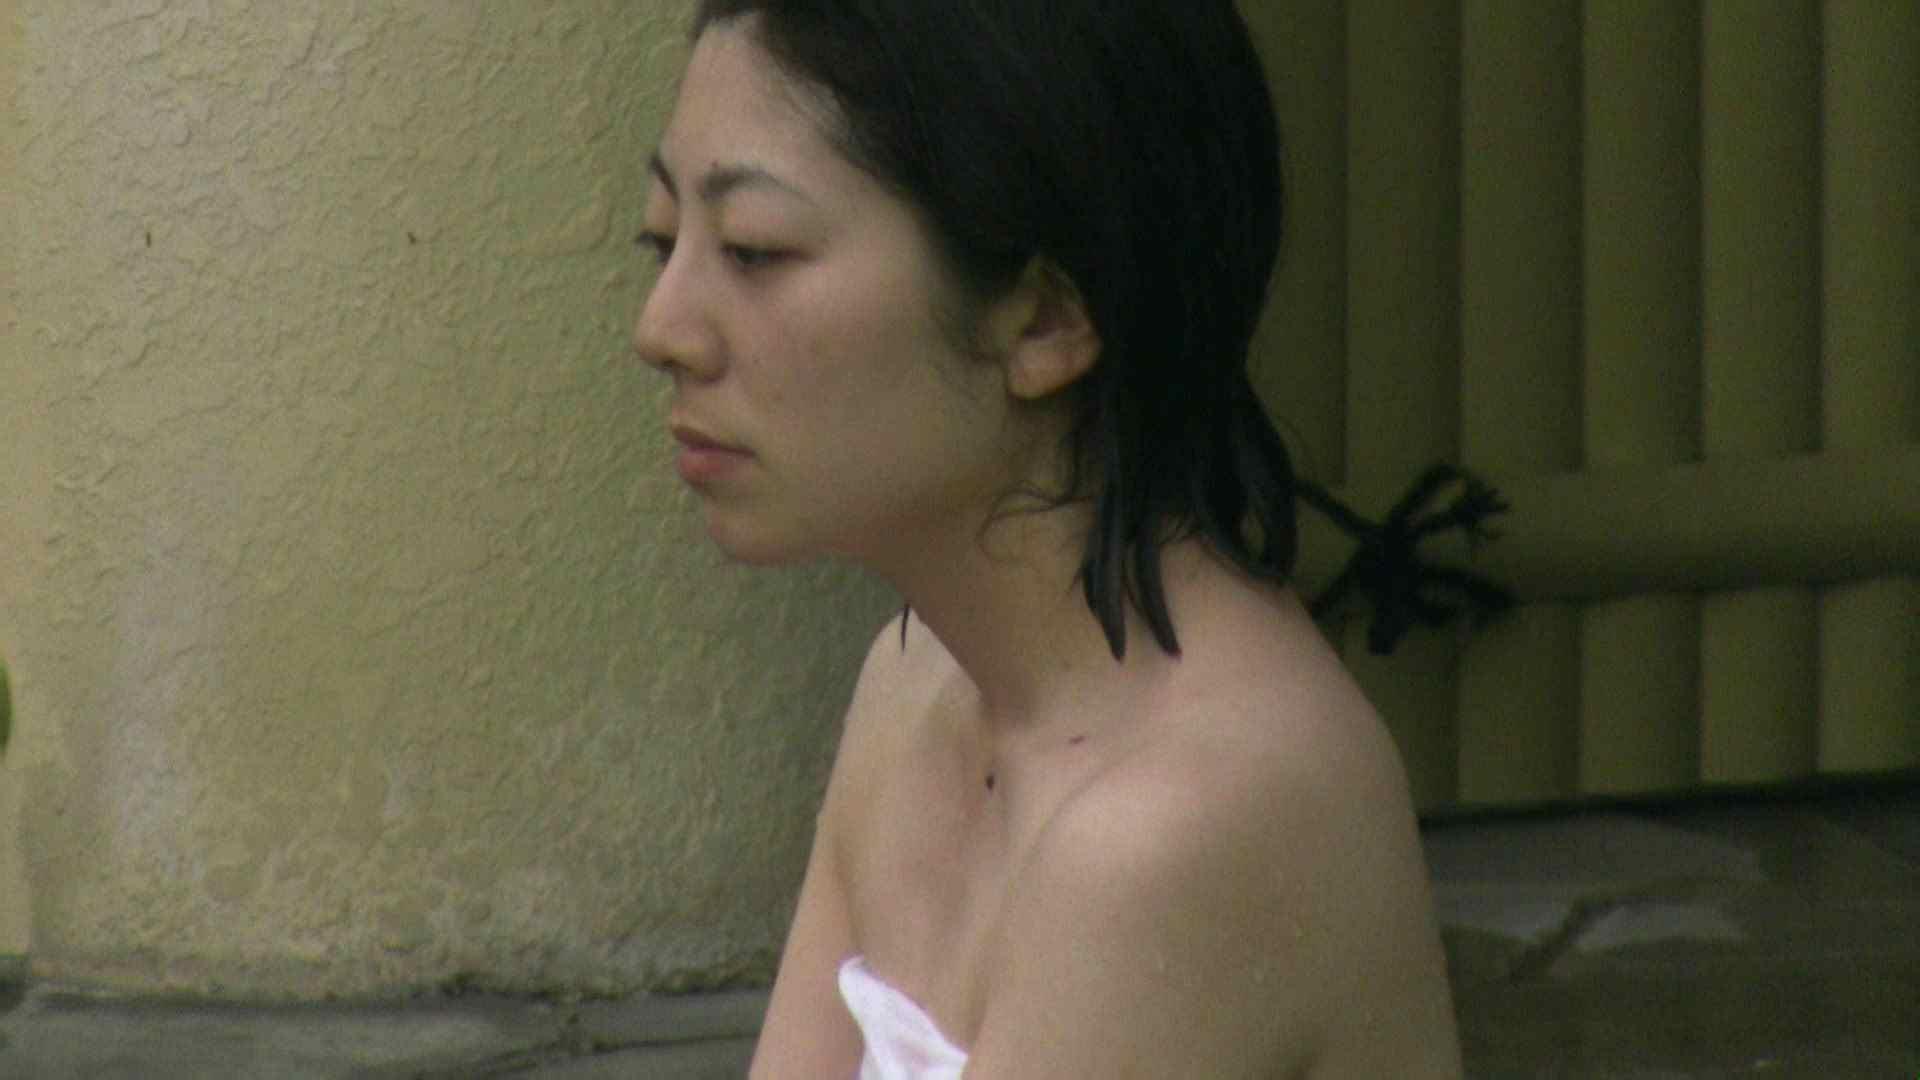 Aquaな露天風呂Vol.04 露天風呂編  94PIX 42